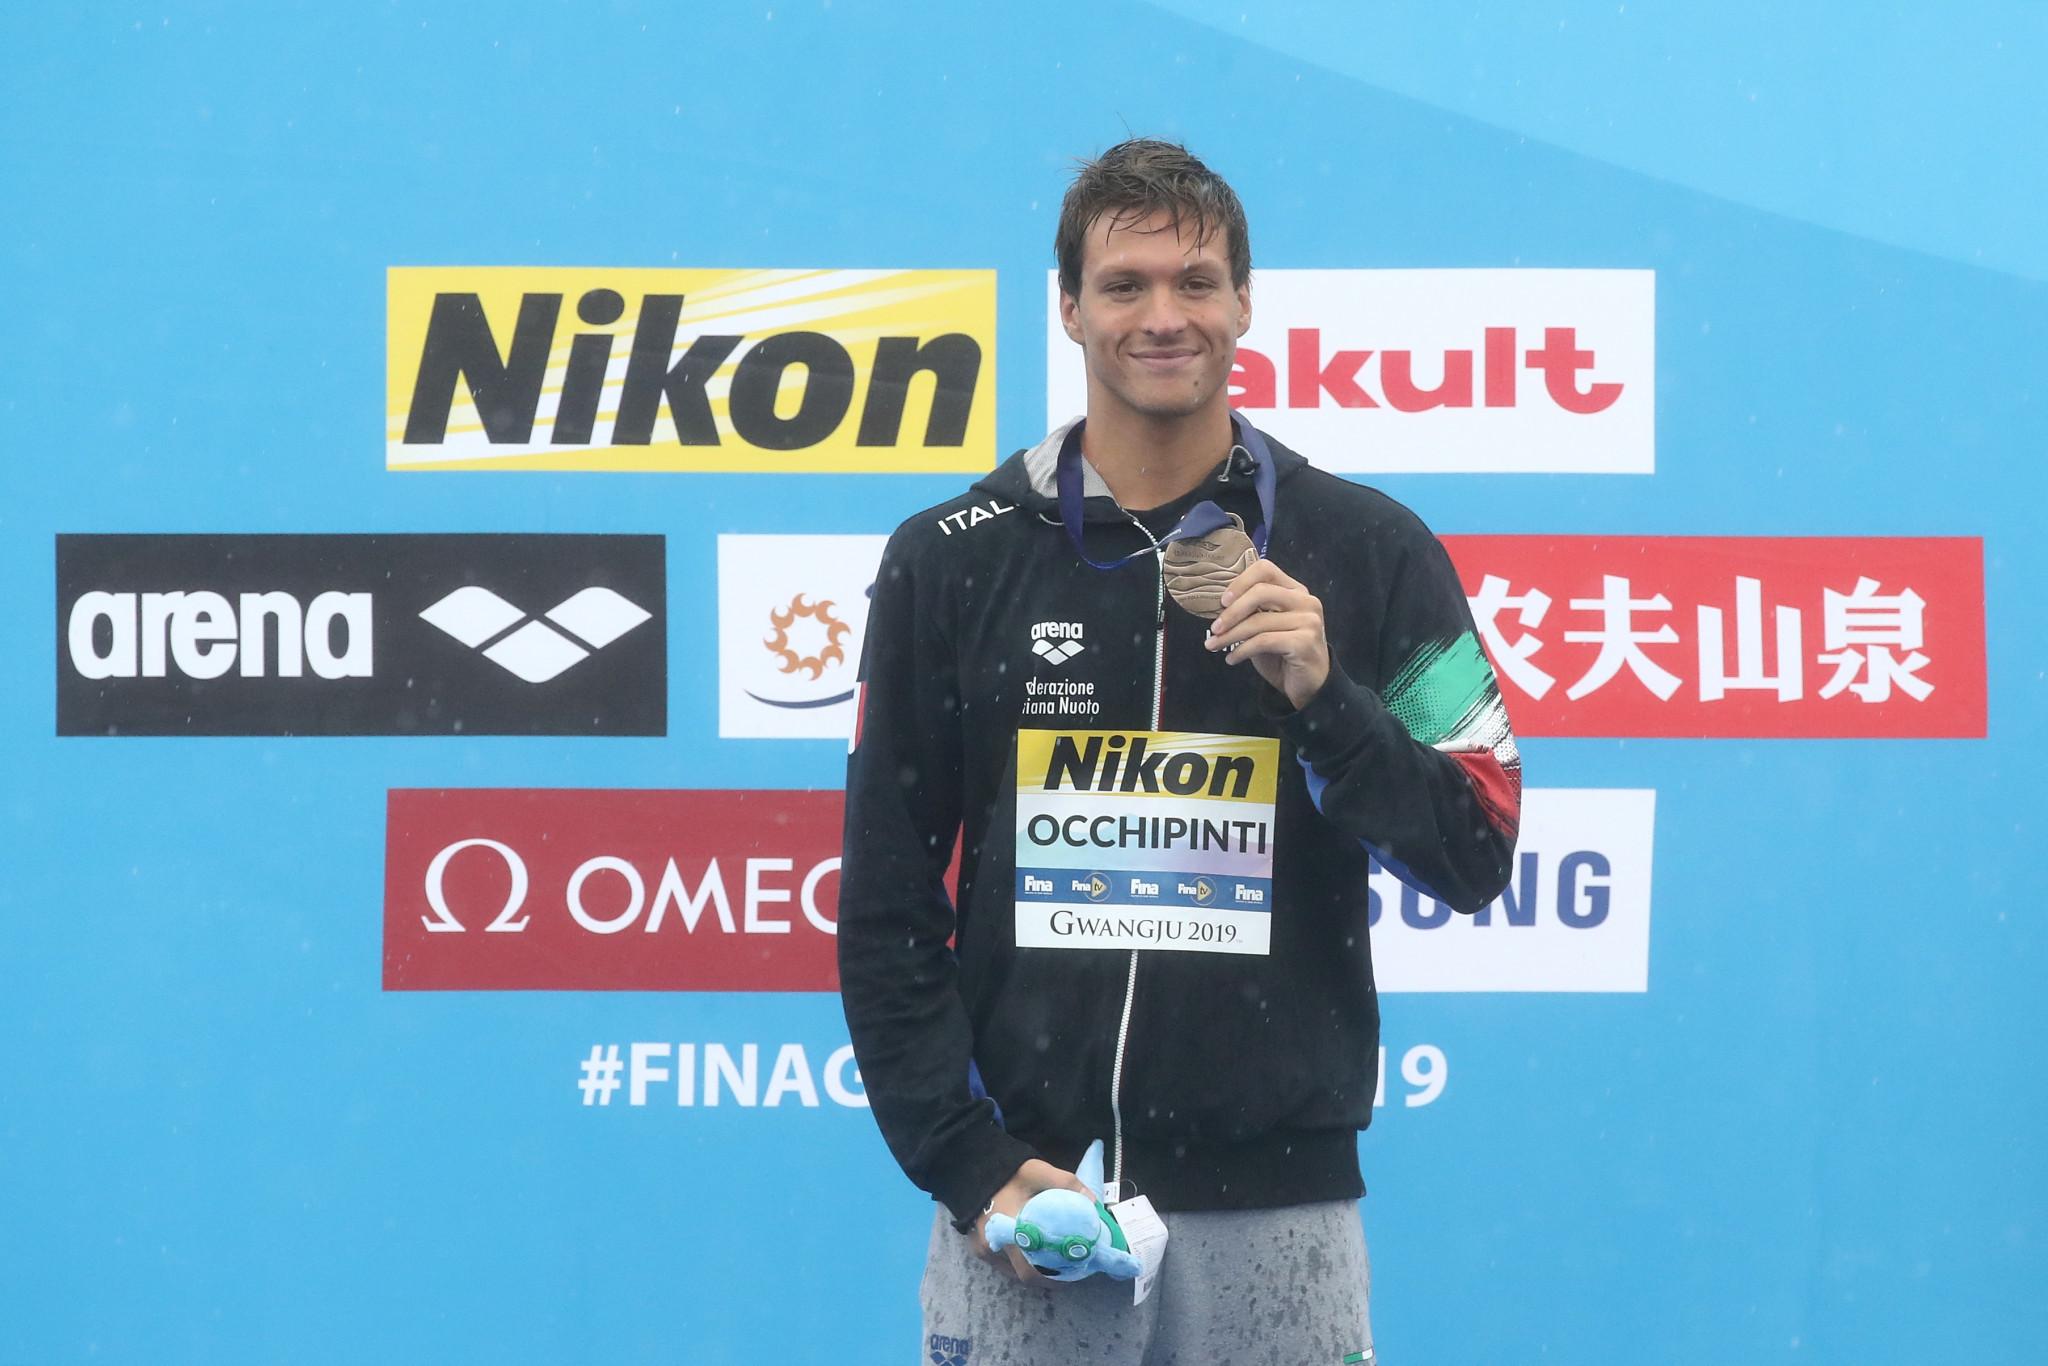 Jouisse and Occhipinti win women's and men's races in Capri-Napoli leg of FINA UltraMarathon Swim Series